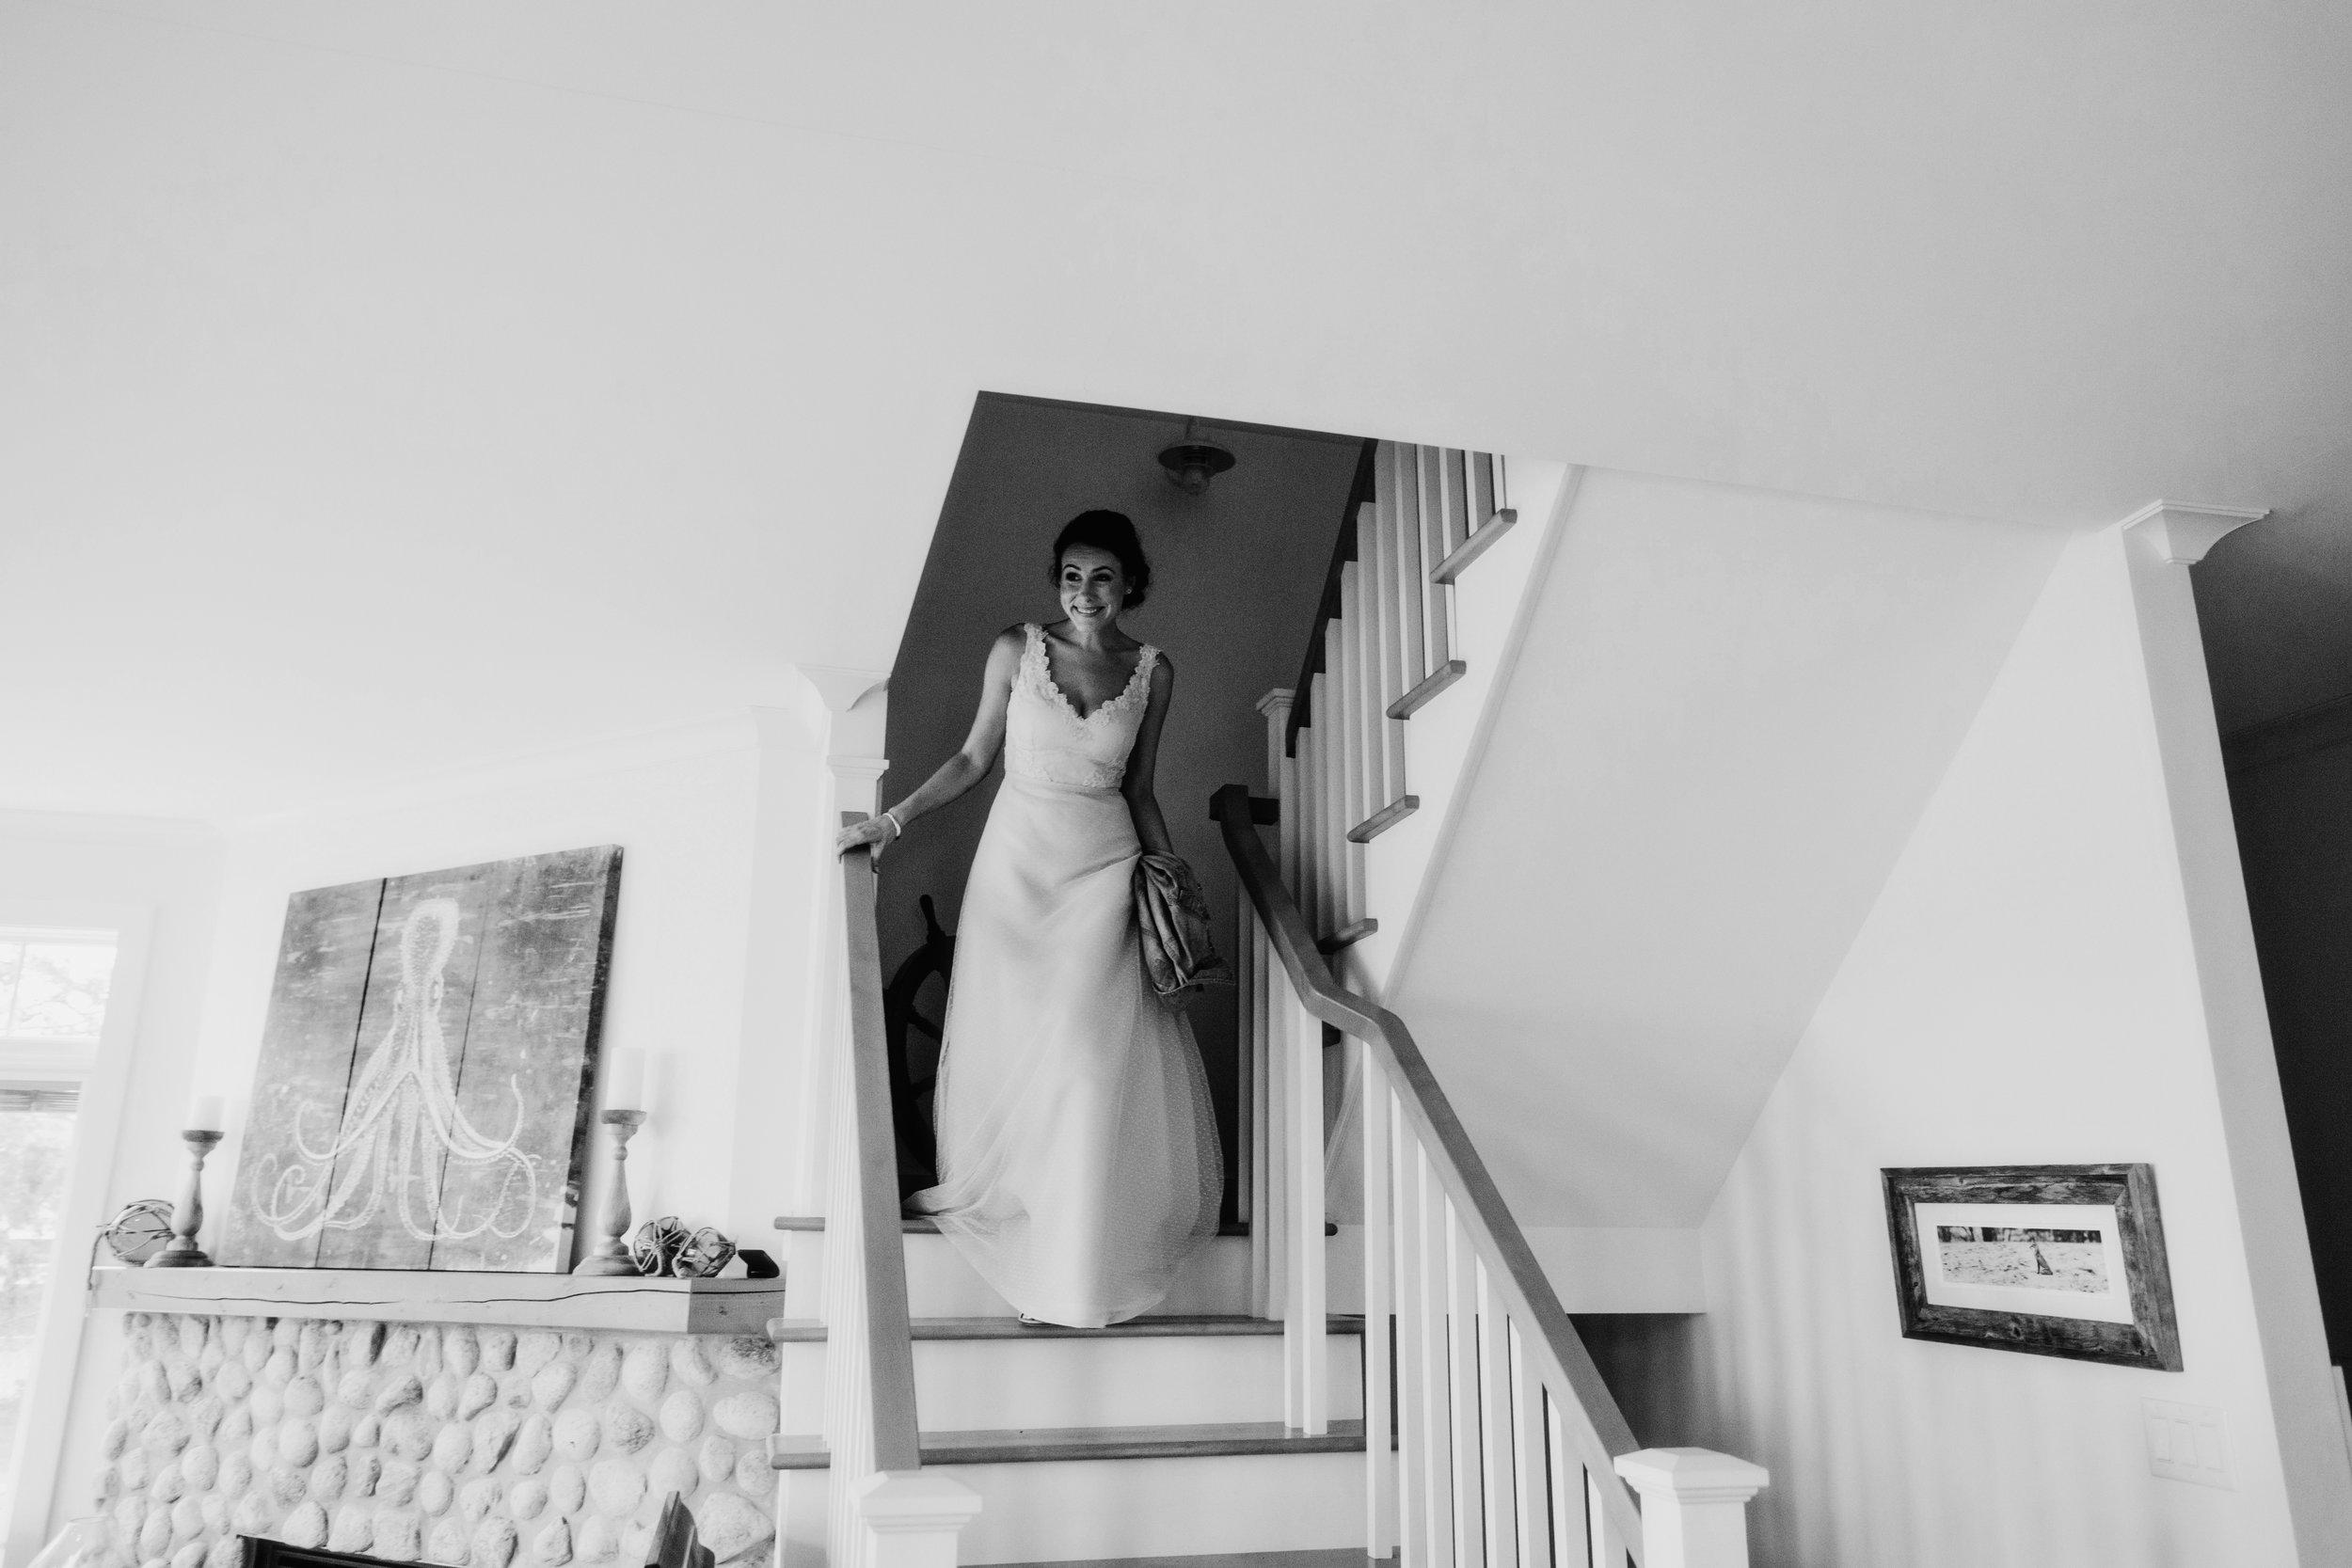 prince-edward-island-cottage-wedding-photos-0035.JPG